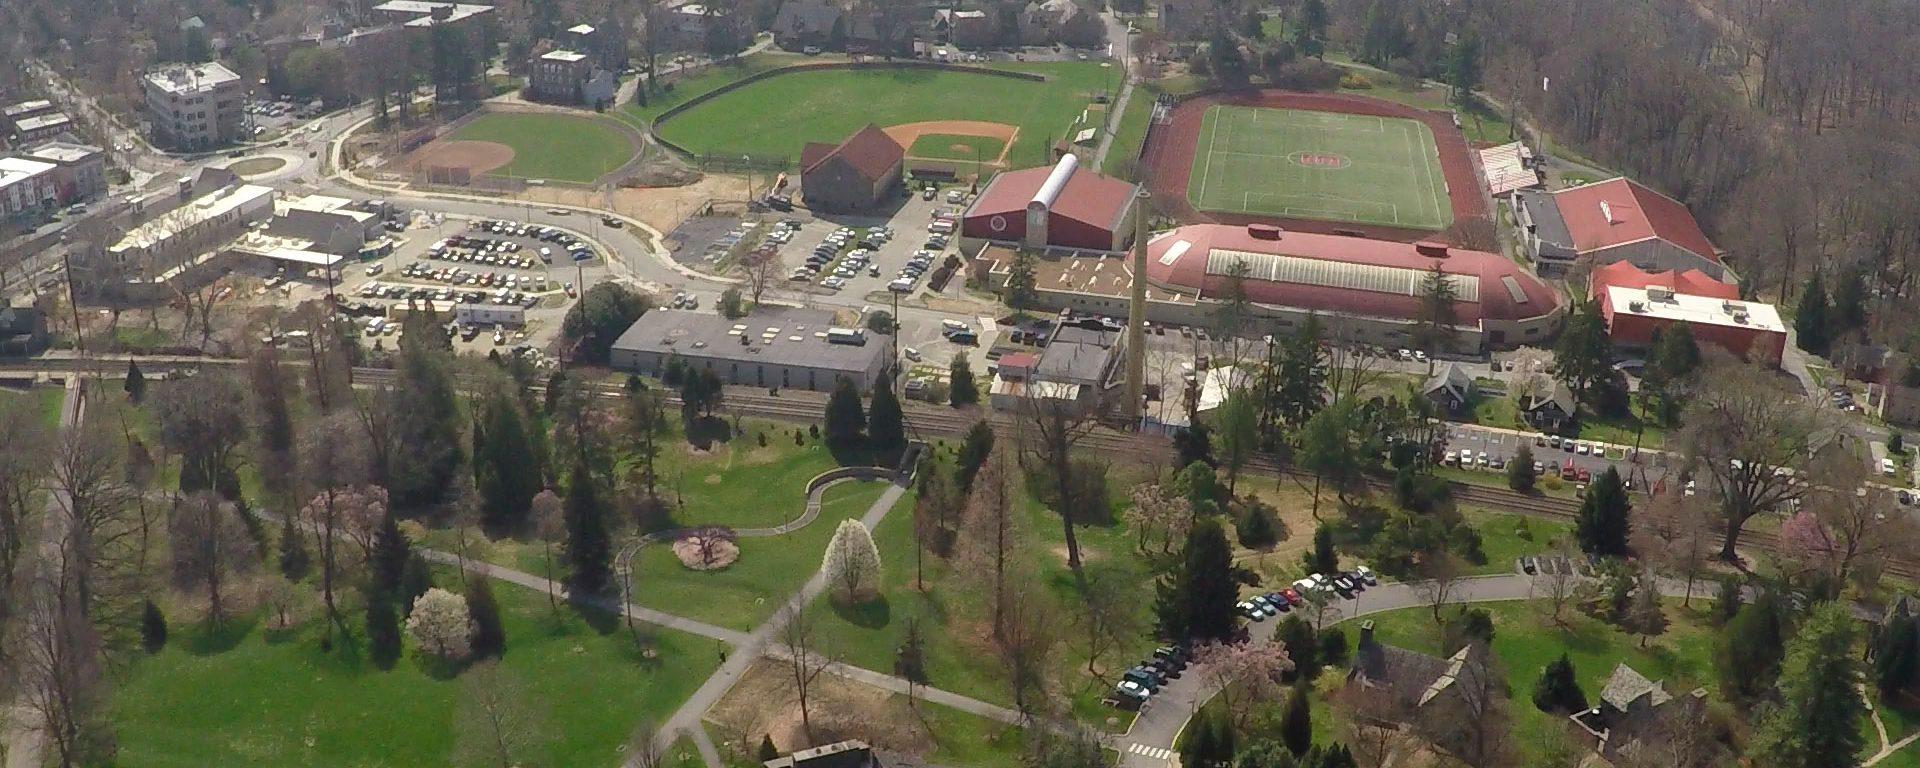 Swarthmore Campus GIS – Swarthmore College ITS Blog